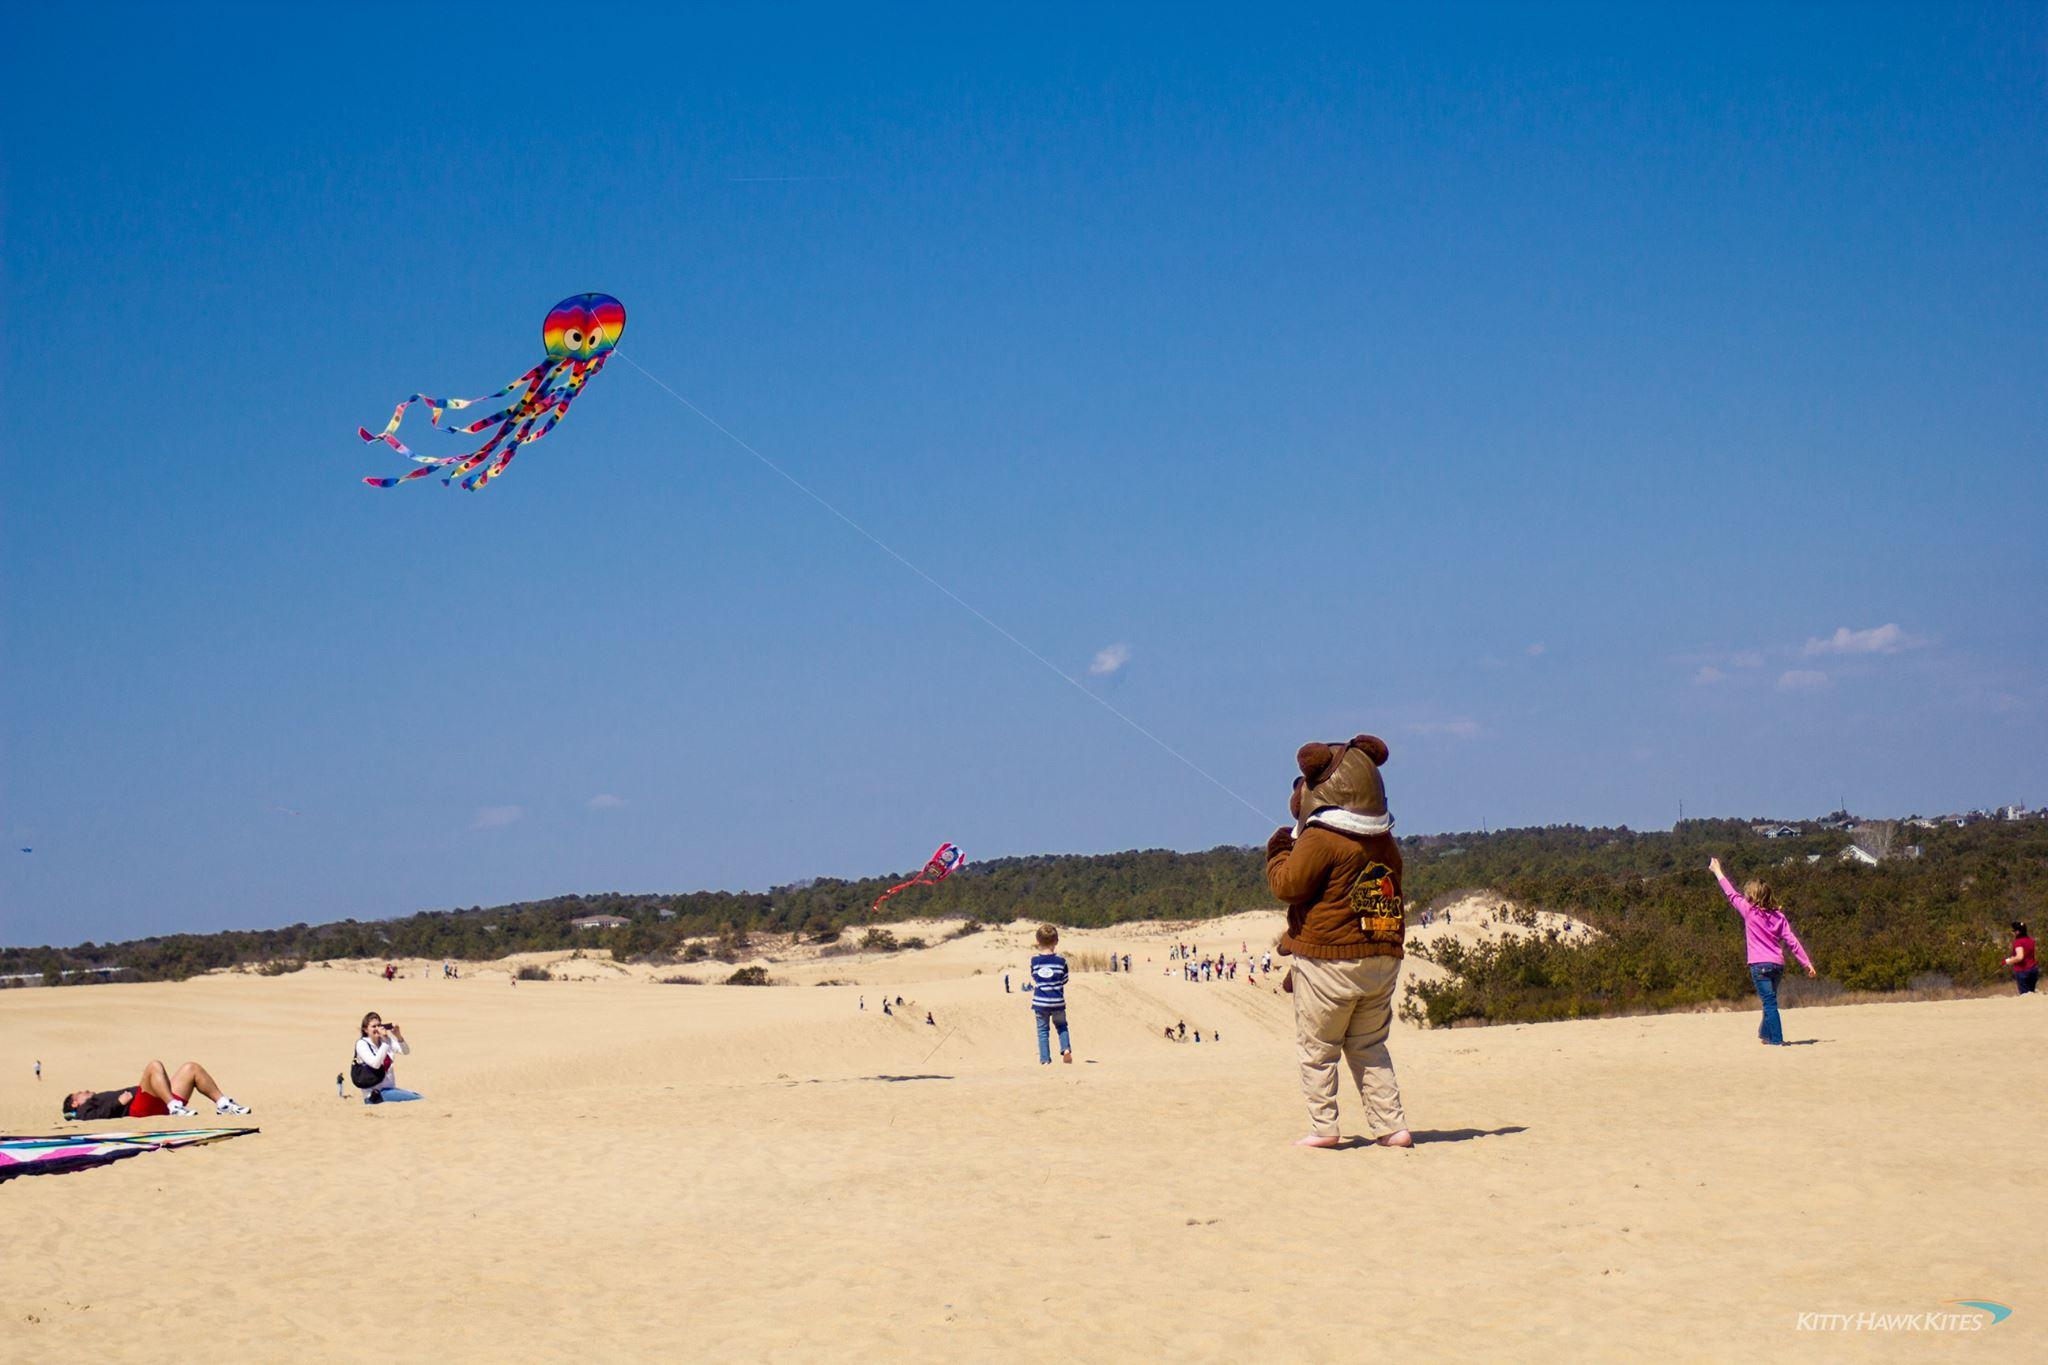 Flying kites at Jockey's Ridge State Park